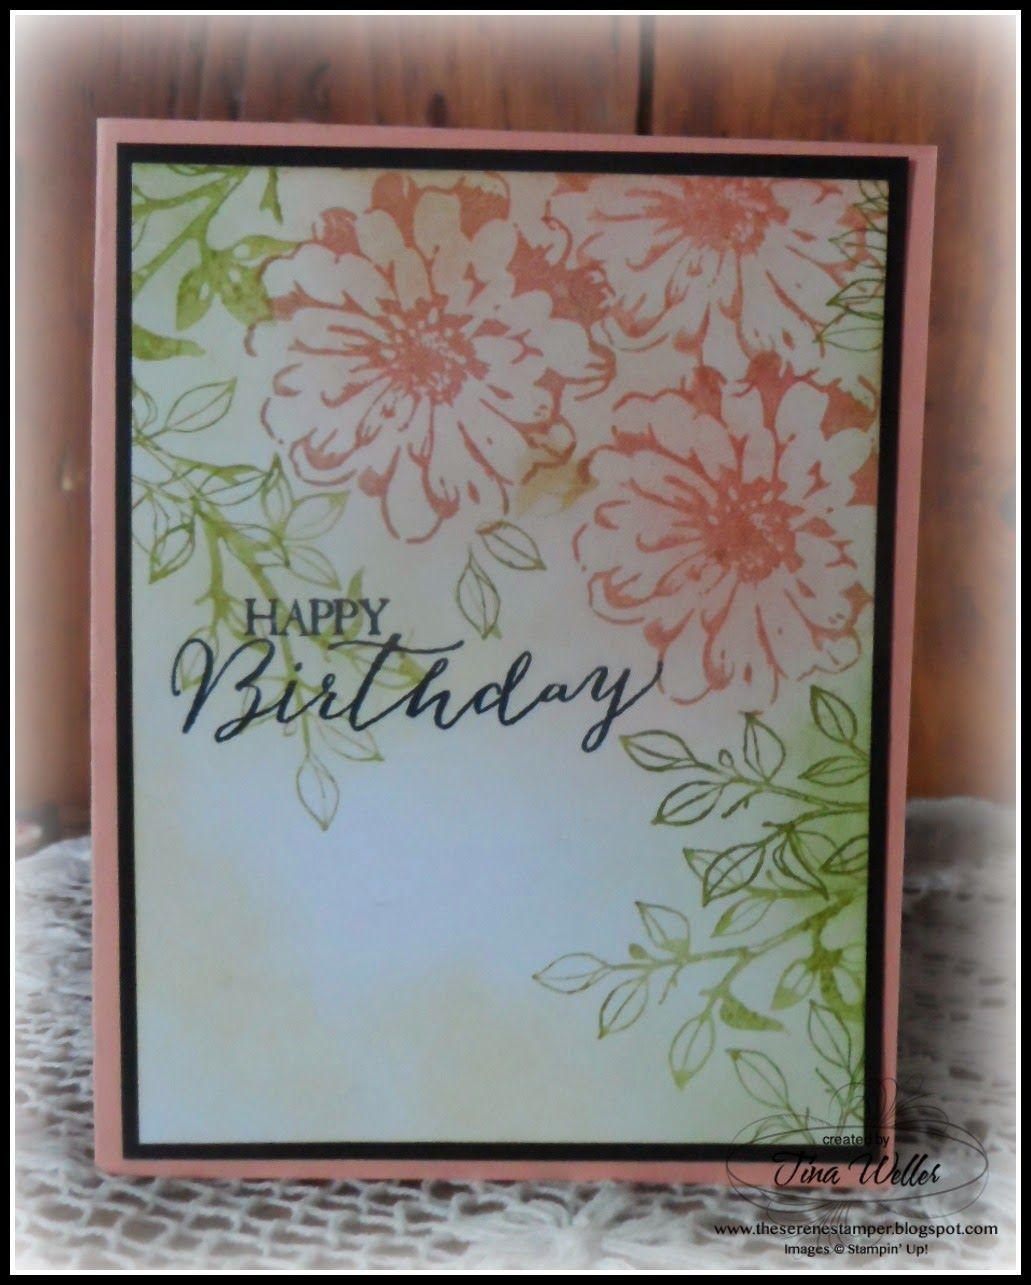 Quick birthday card happy wednesday east coast and birthdays